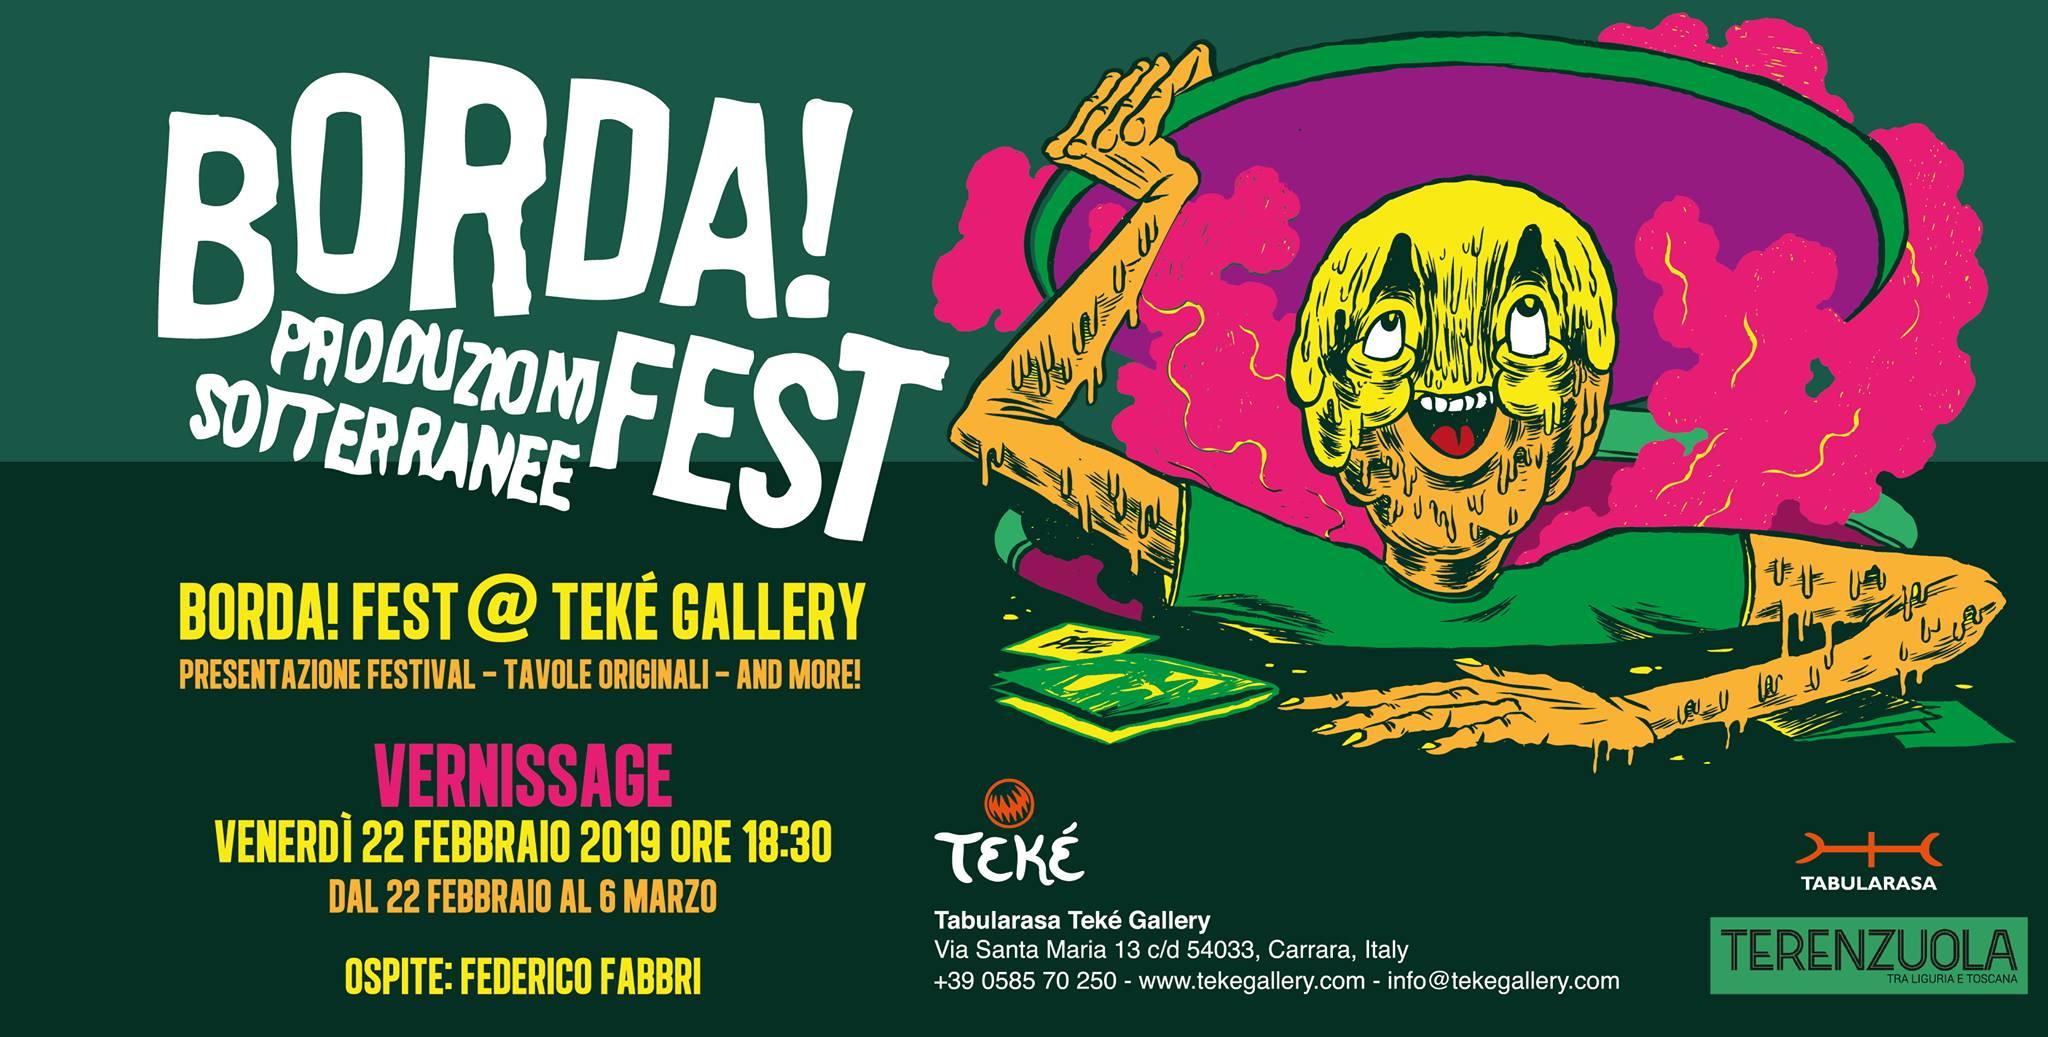 Borda!Fest 8 - fanzine